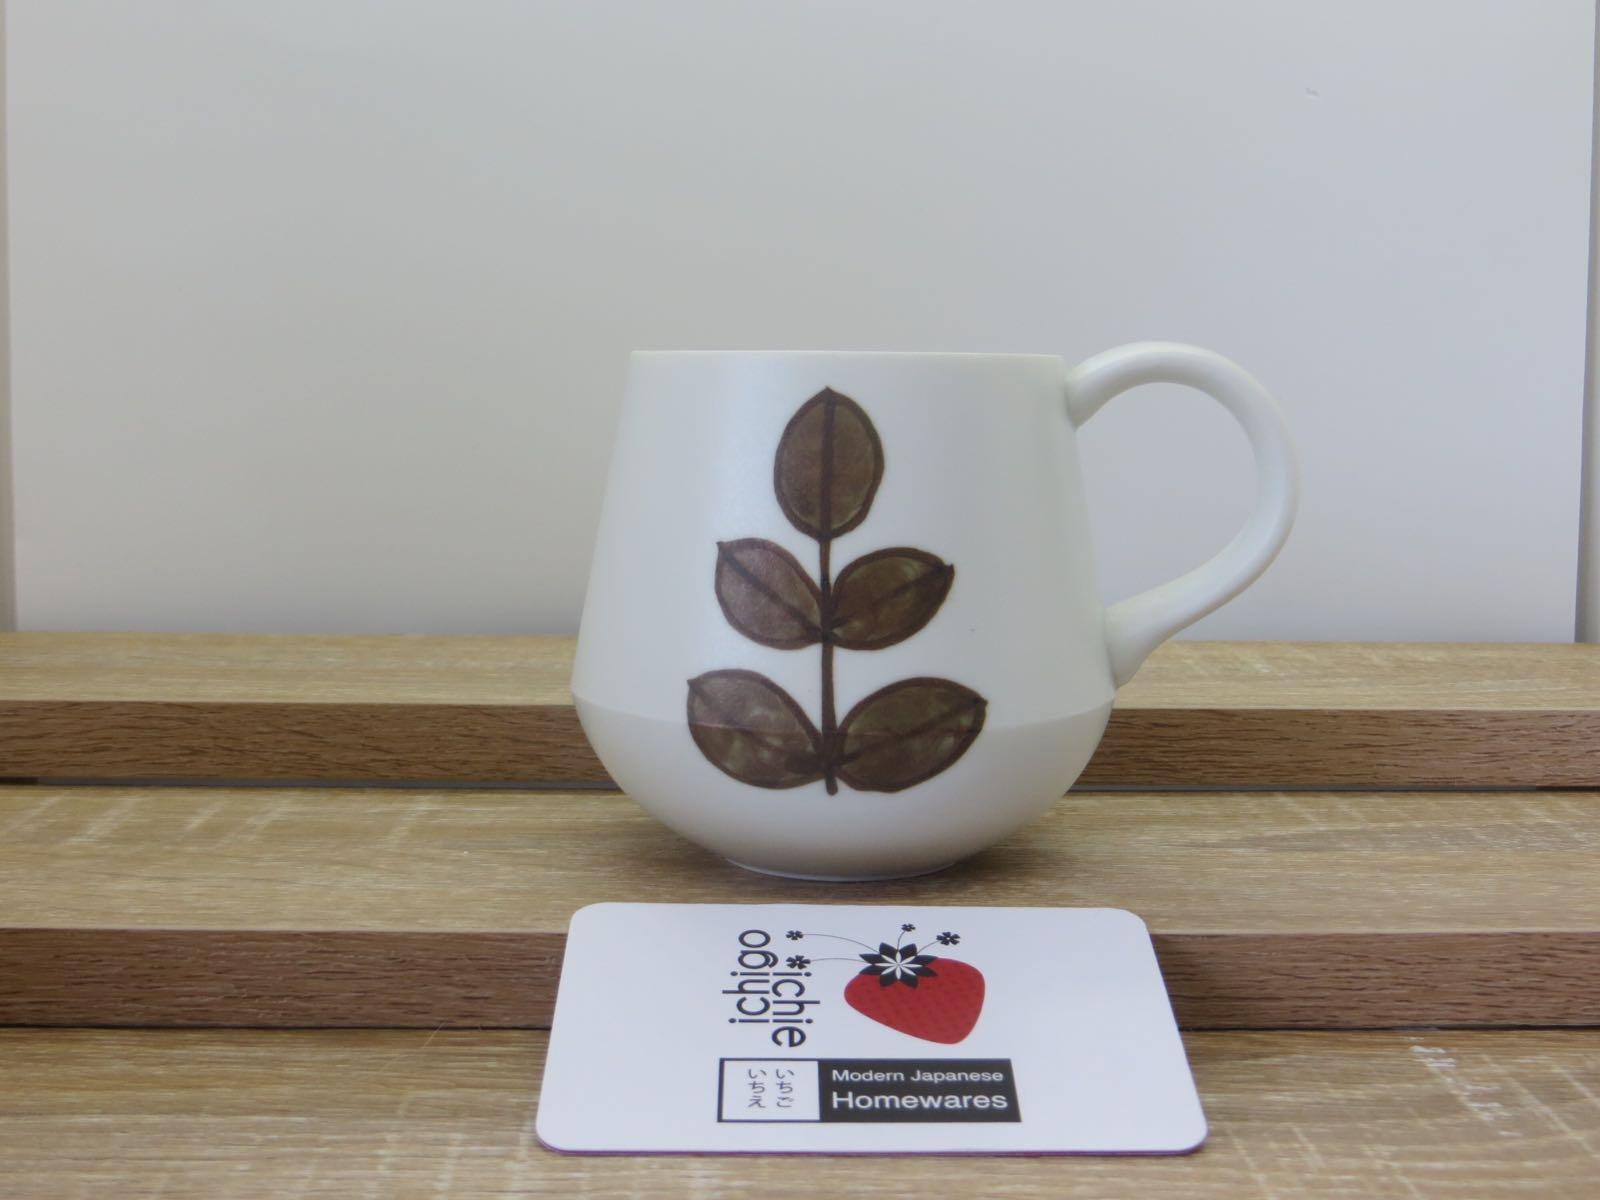 KIHARA Fiore Mug (1 piece)